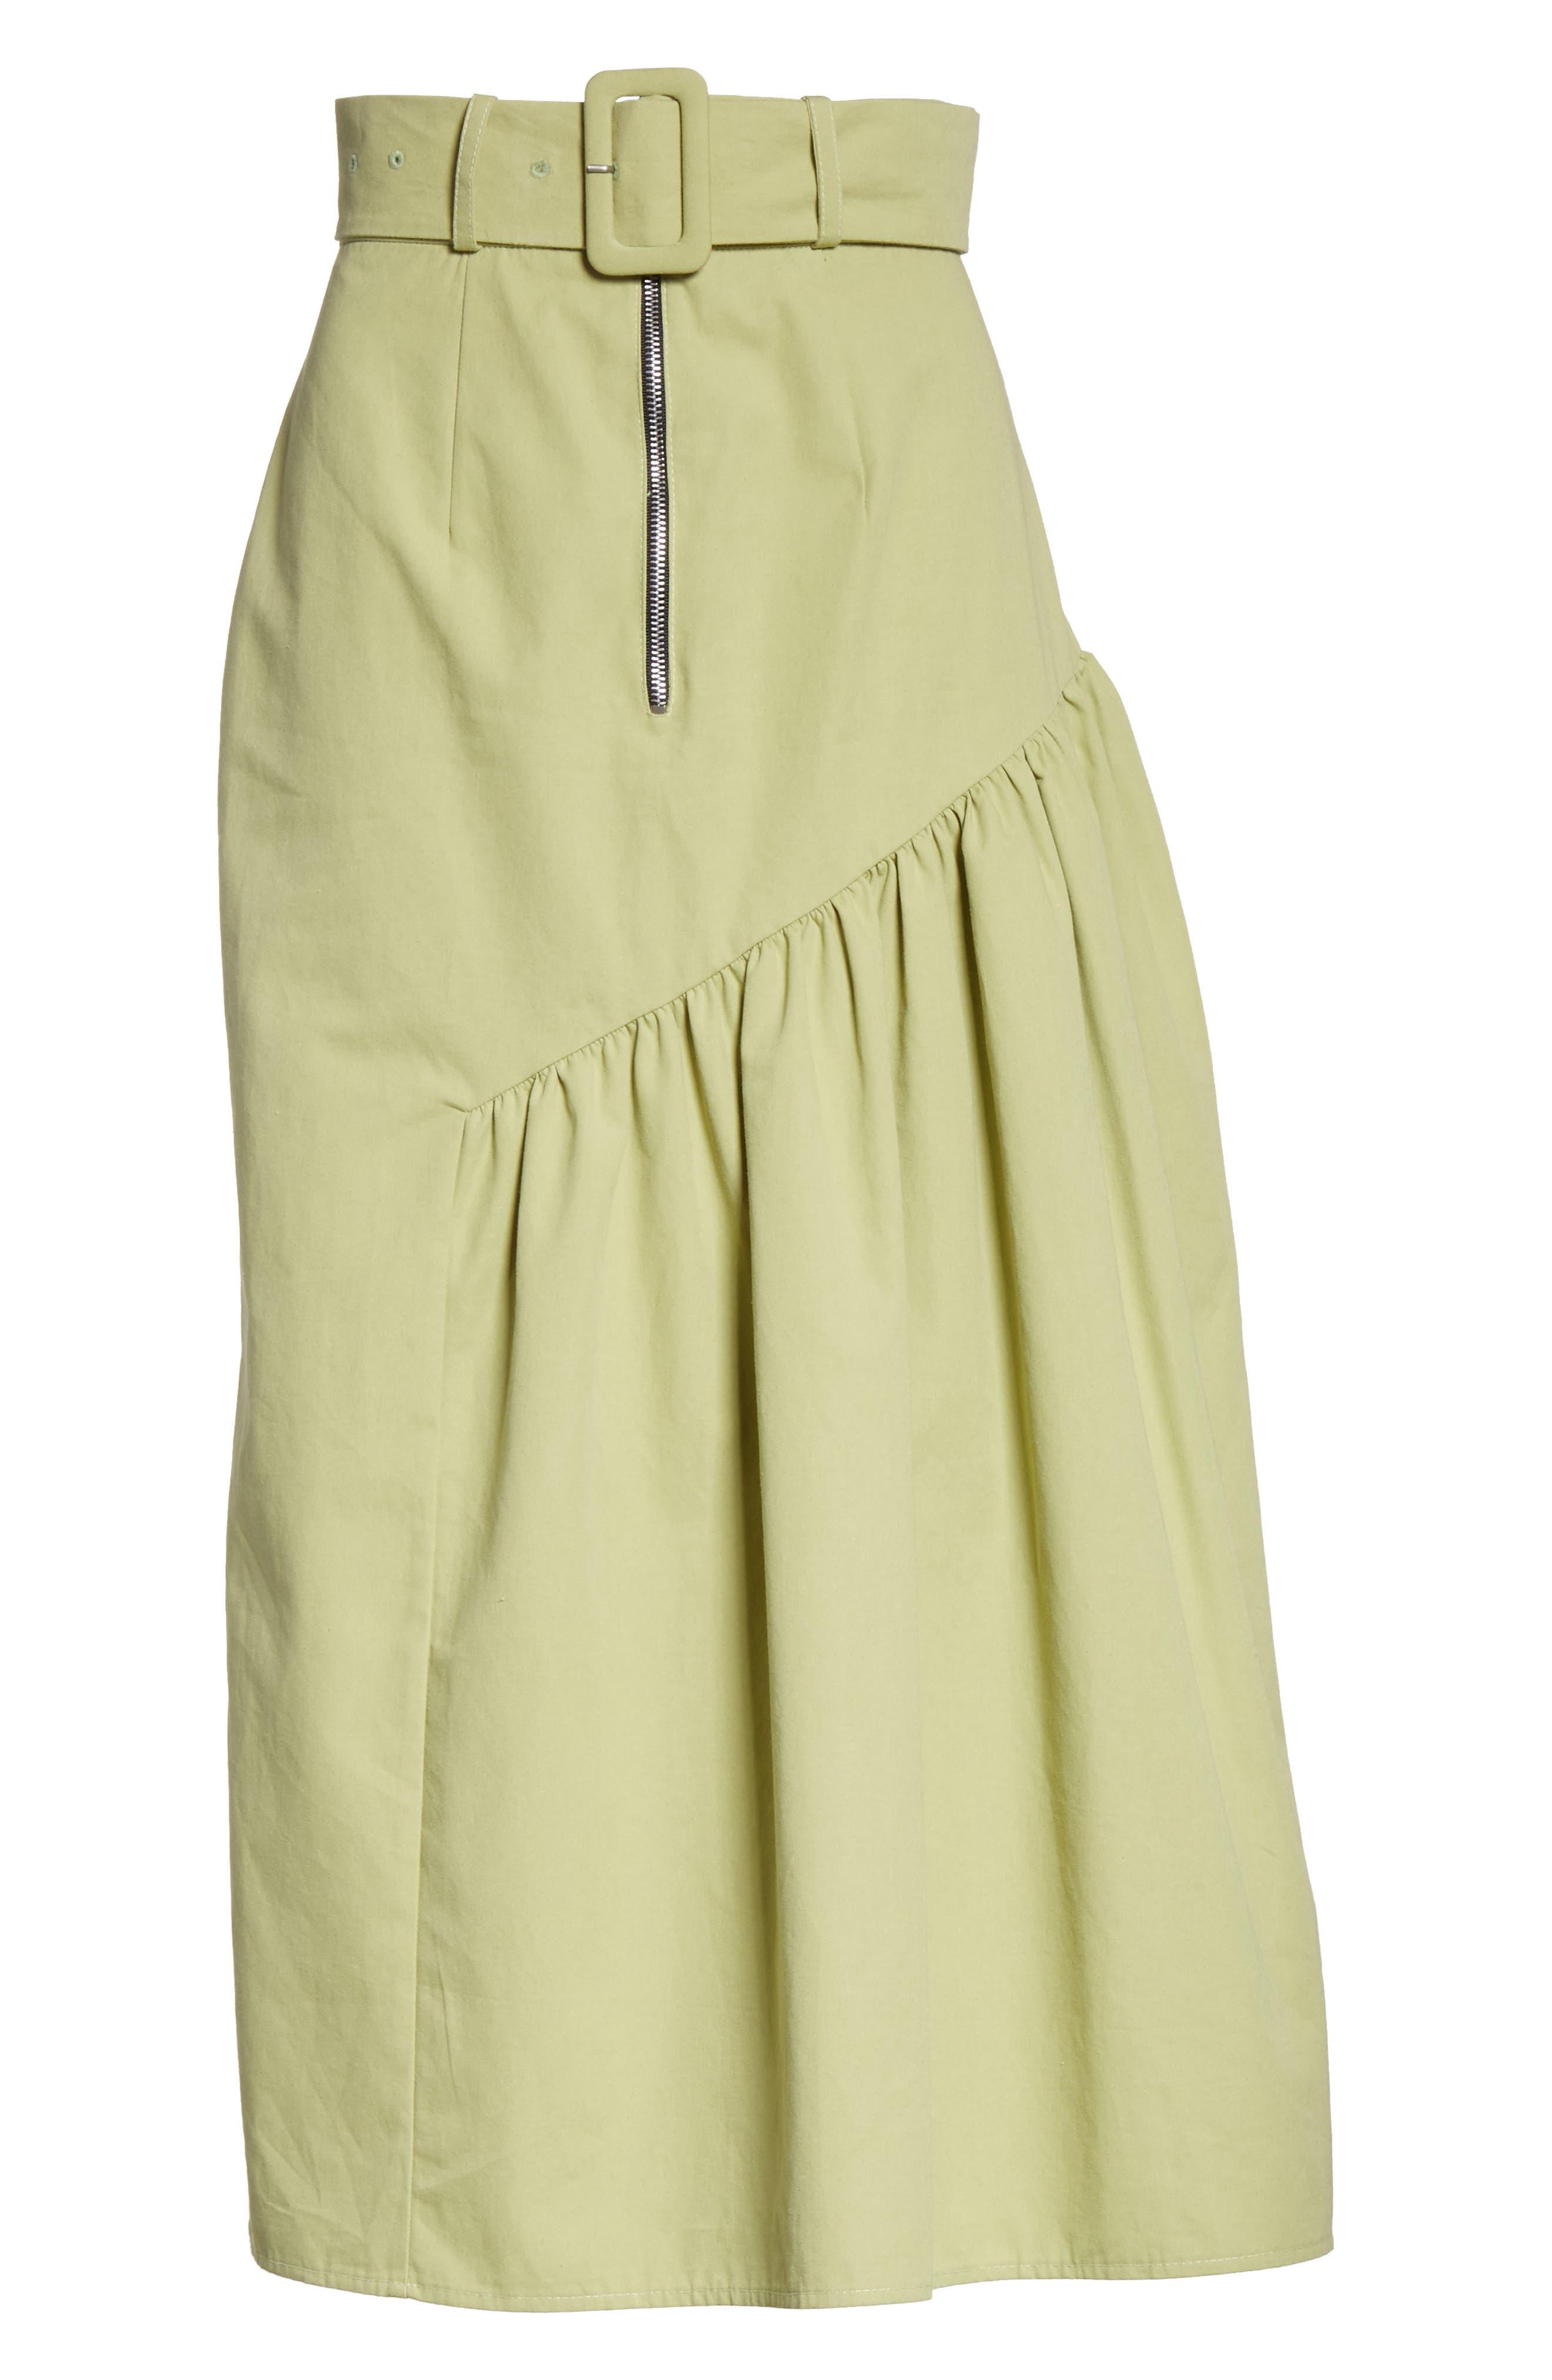 Belted High Waist Ruffle Skirt,                             Alternate thumbnail 6, color,